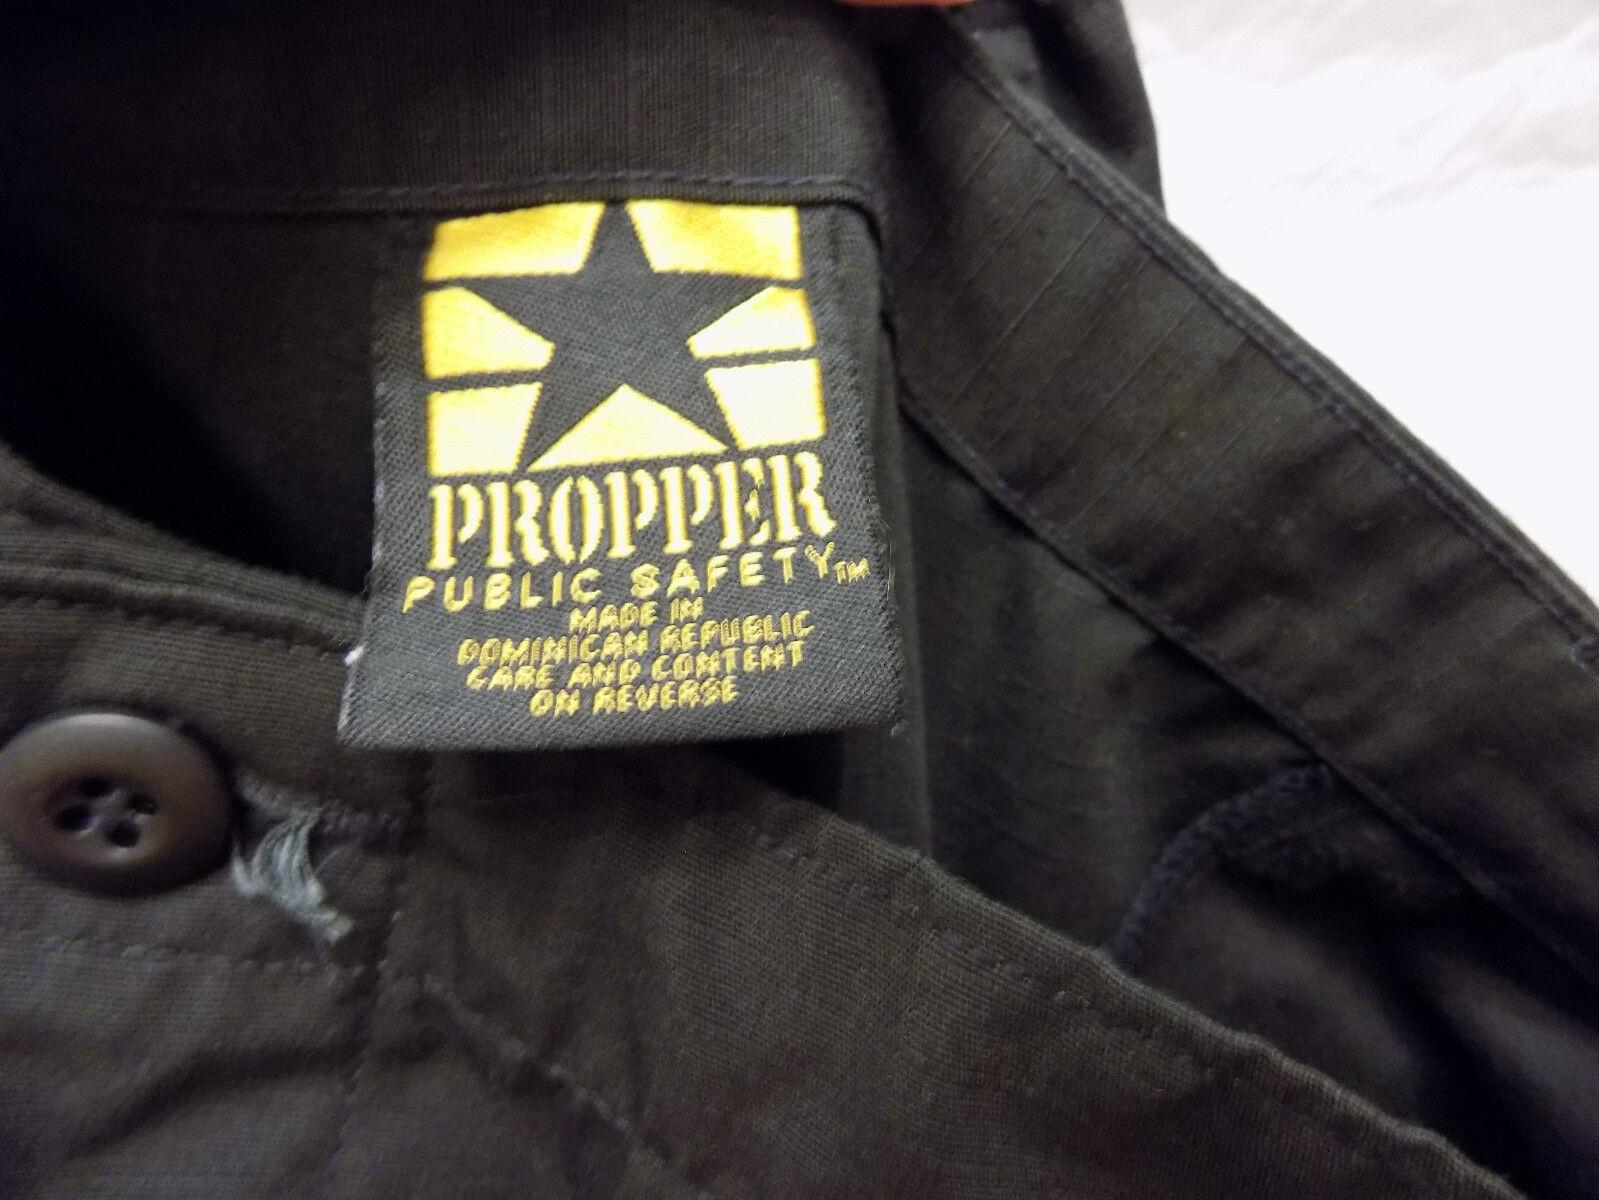 Nuevo Hombre PROPPER Cargo Pants Negro Xxx Large Regular Regular Regular 119cm 122cm 124cm 127cm dd7c90